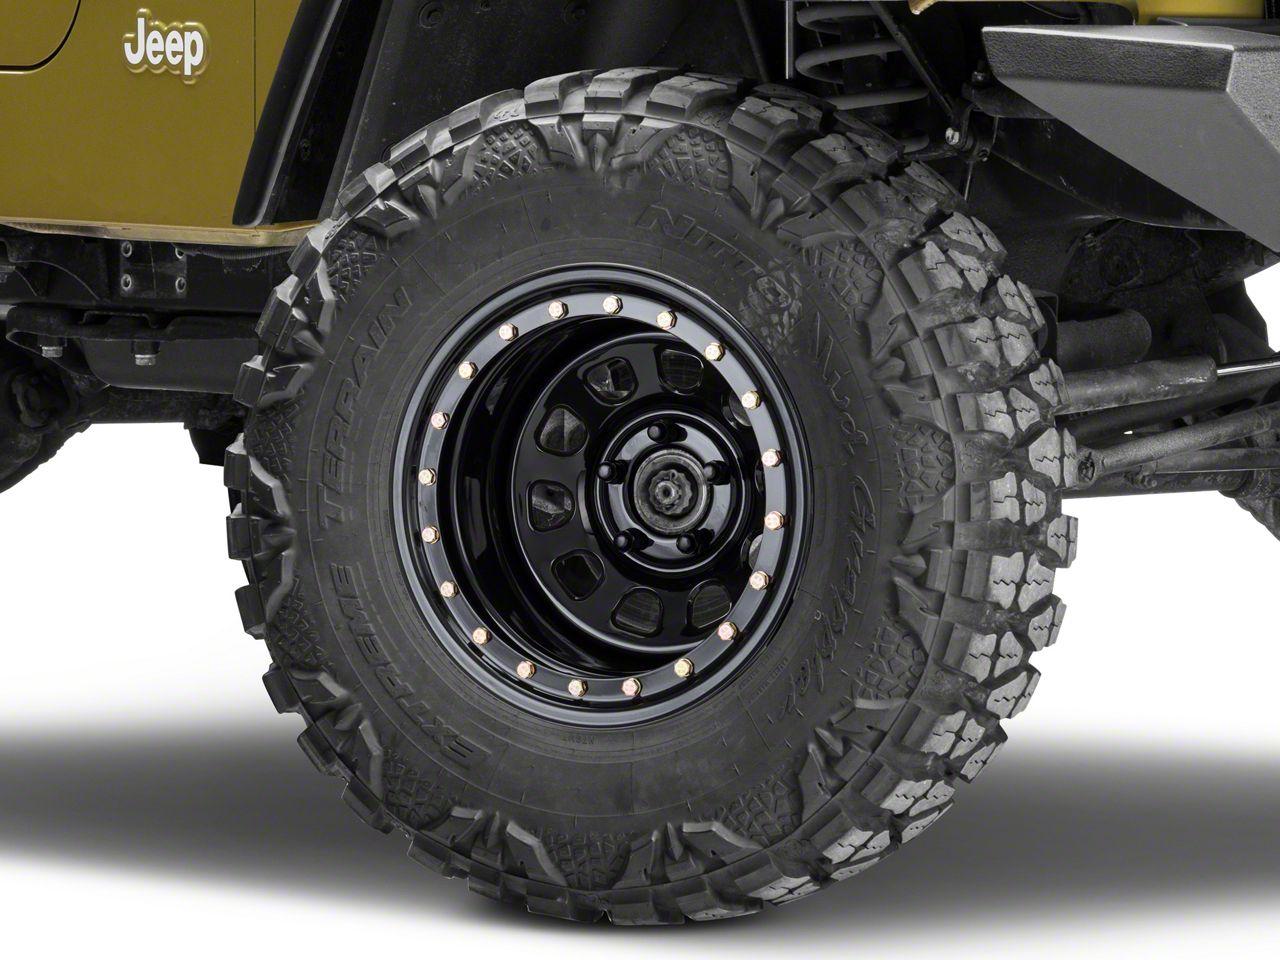 Pro Comp Steel Series 252 Street Lock Gloss Black Wheel - 15x10 (87-06 Jeep Wrangler YJ & TJ)